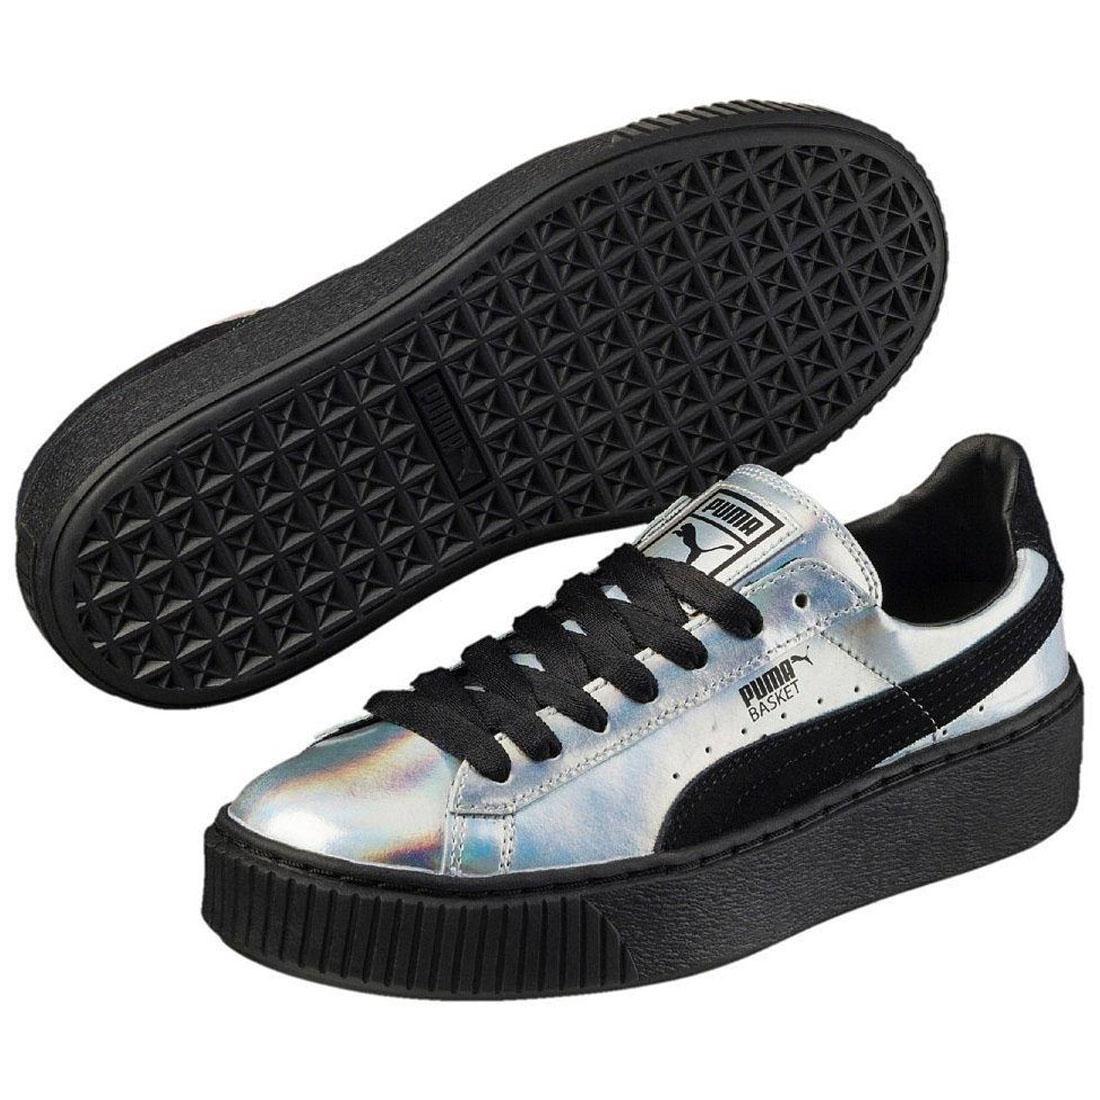 buy popular 8c6c7 650a9 Details about PUMA Basket Trainers Platform Explosive Metallic Silver  Womens Sports Shoes